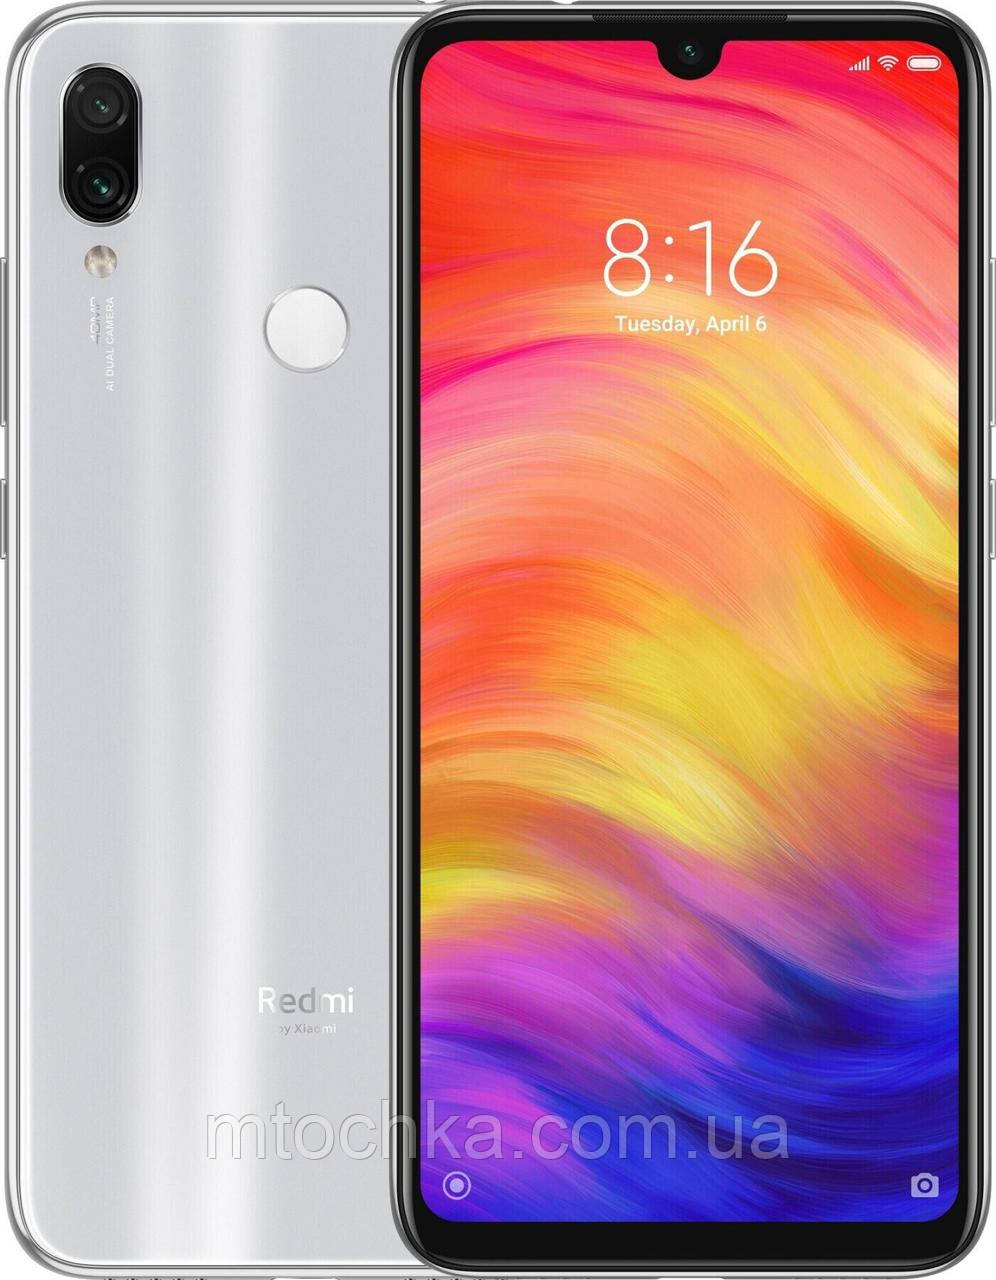 Телефон Xiaomi Redmi Note 7 4/128 GB Moonlight White, фото 1